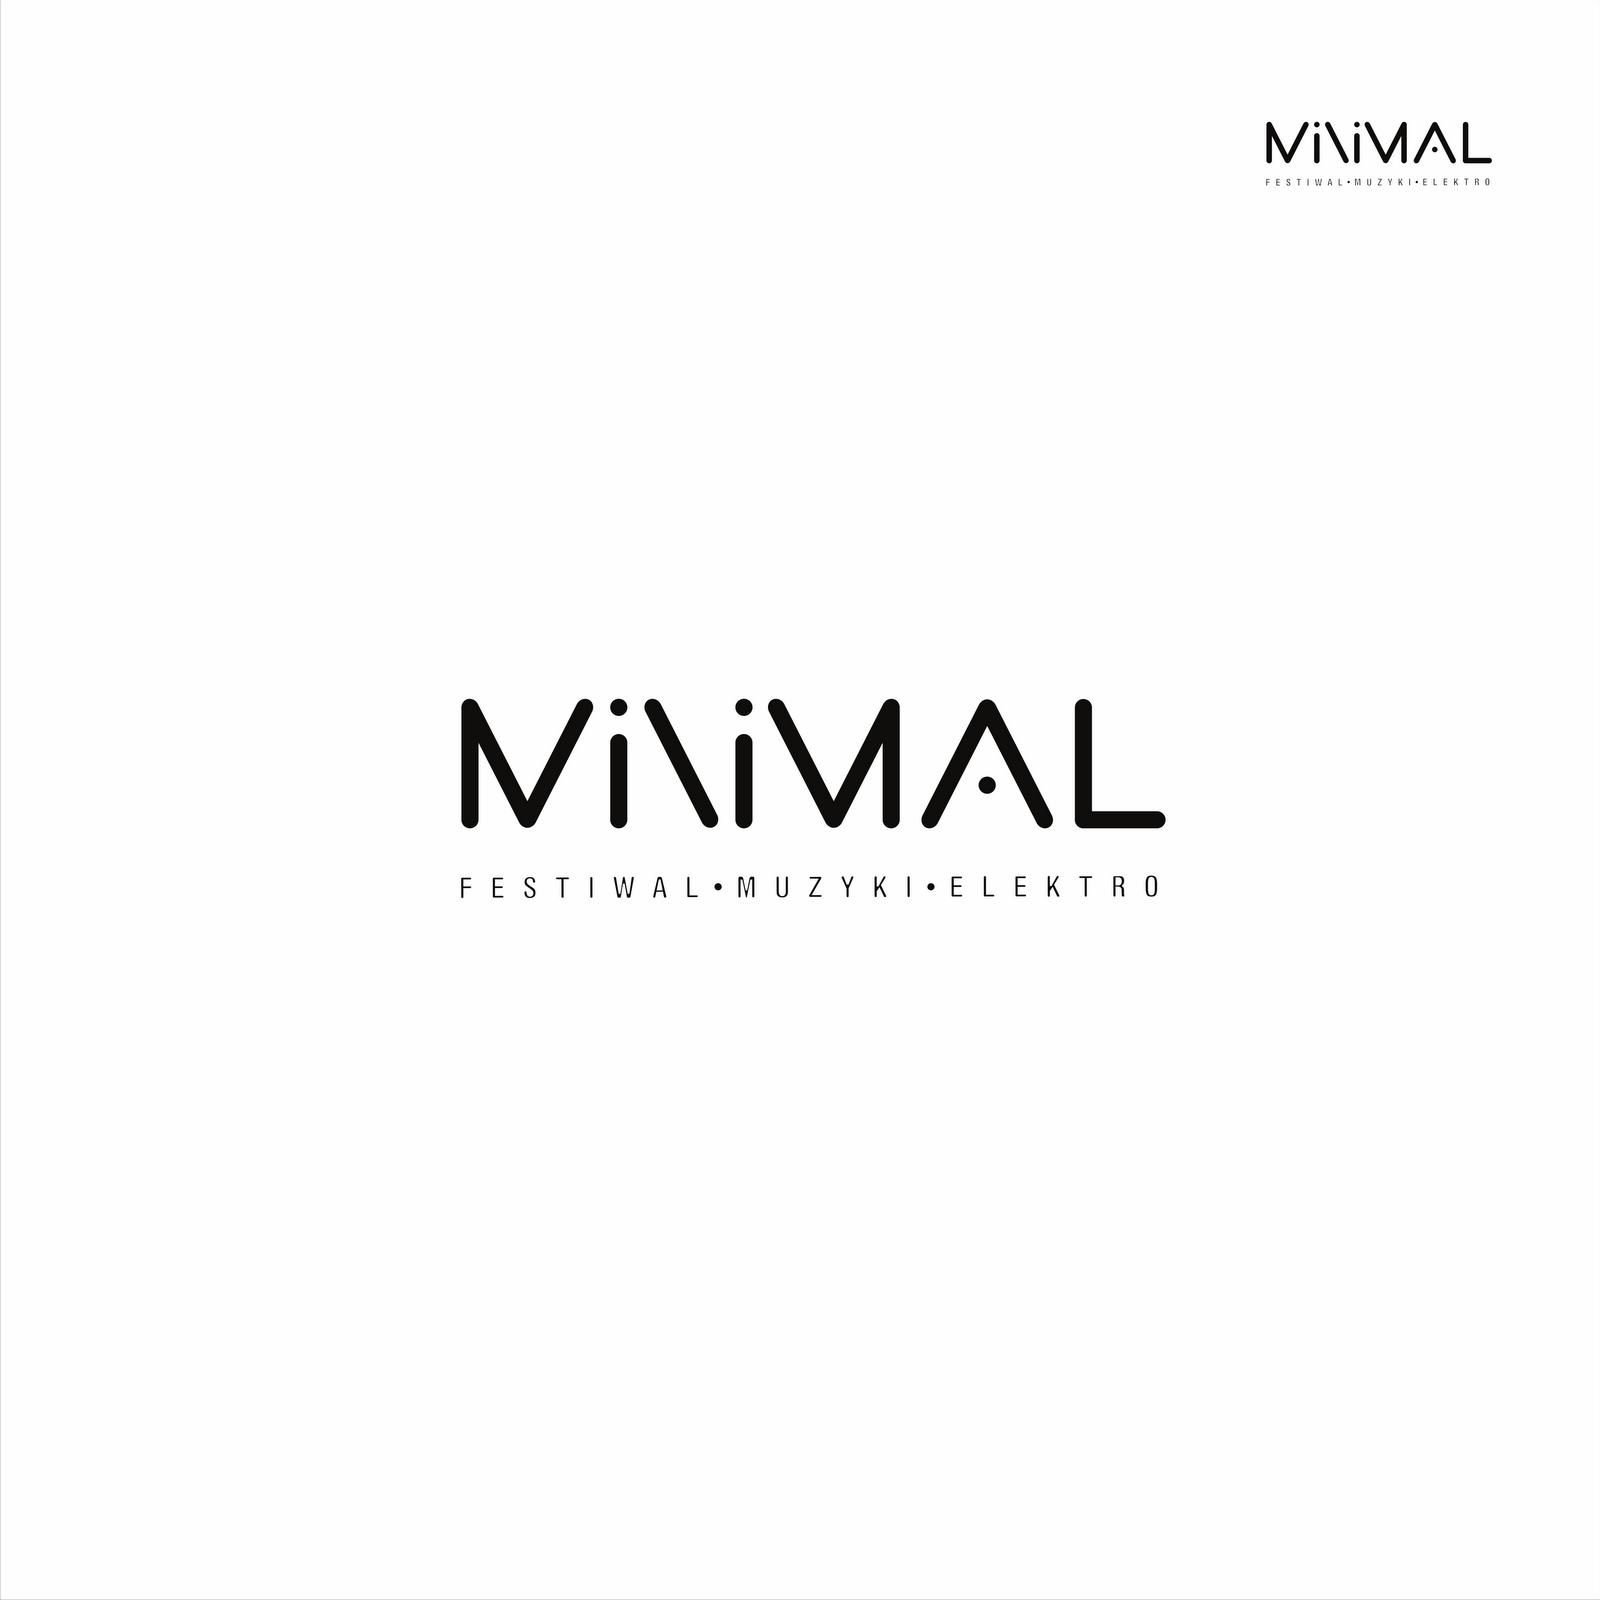 Best 1 600 minimal znak png images on designspiration for Minimal architettura